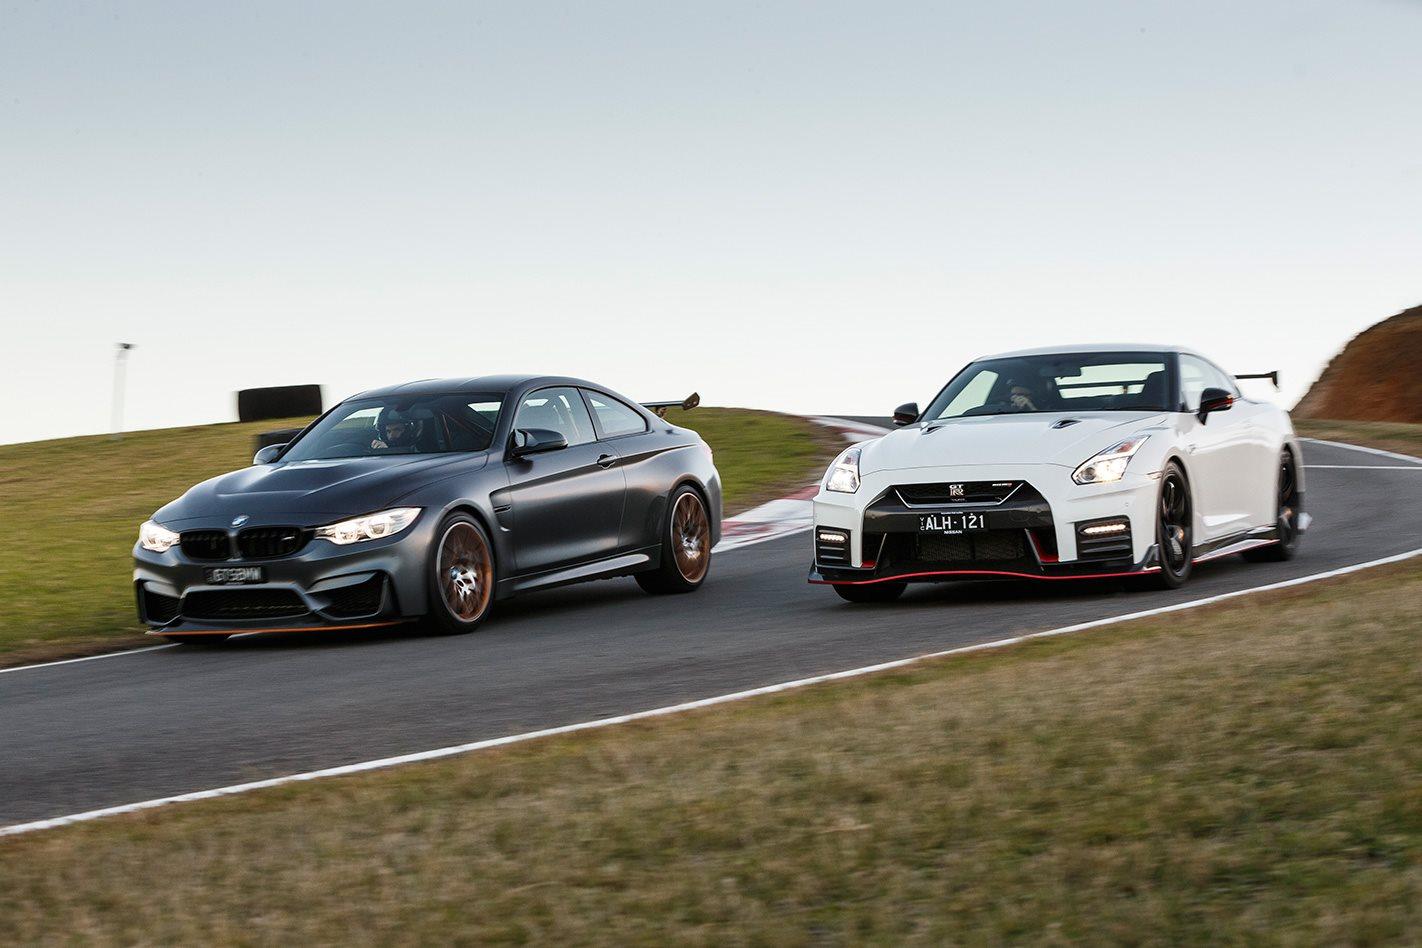 2017 Nissan GT-R NISMO vs 2017 BMW M4 GTS front.jpg